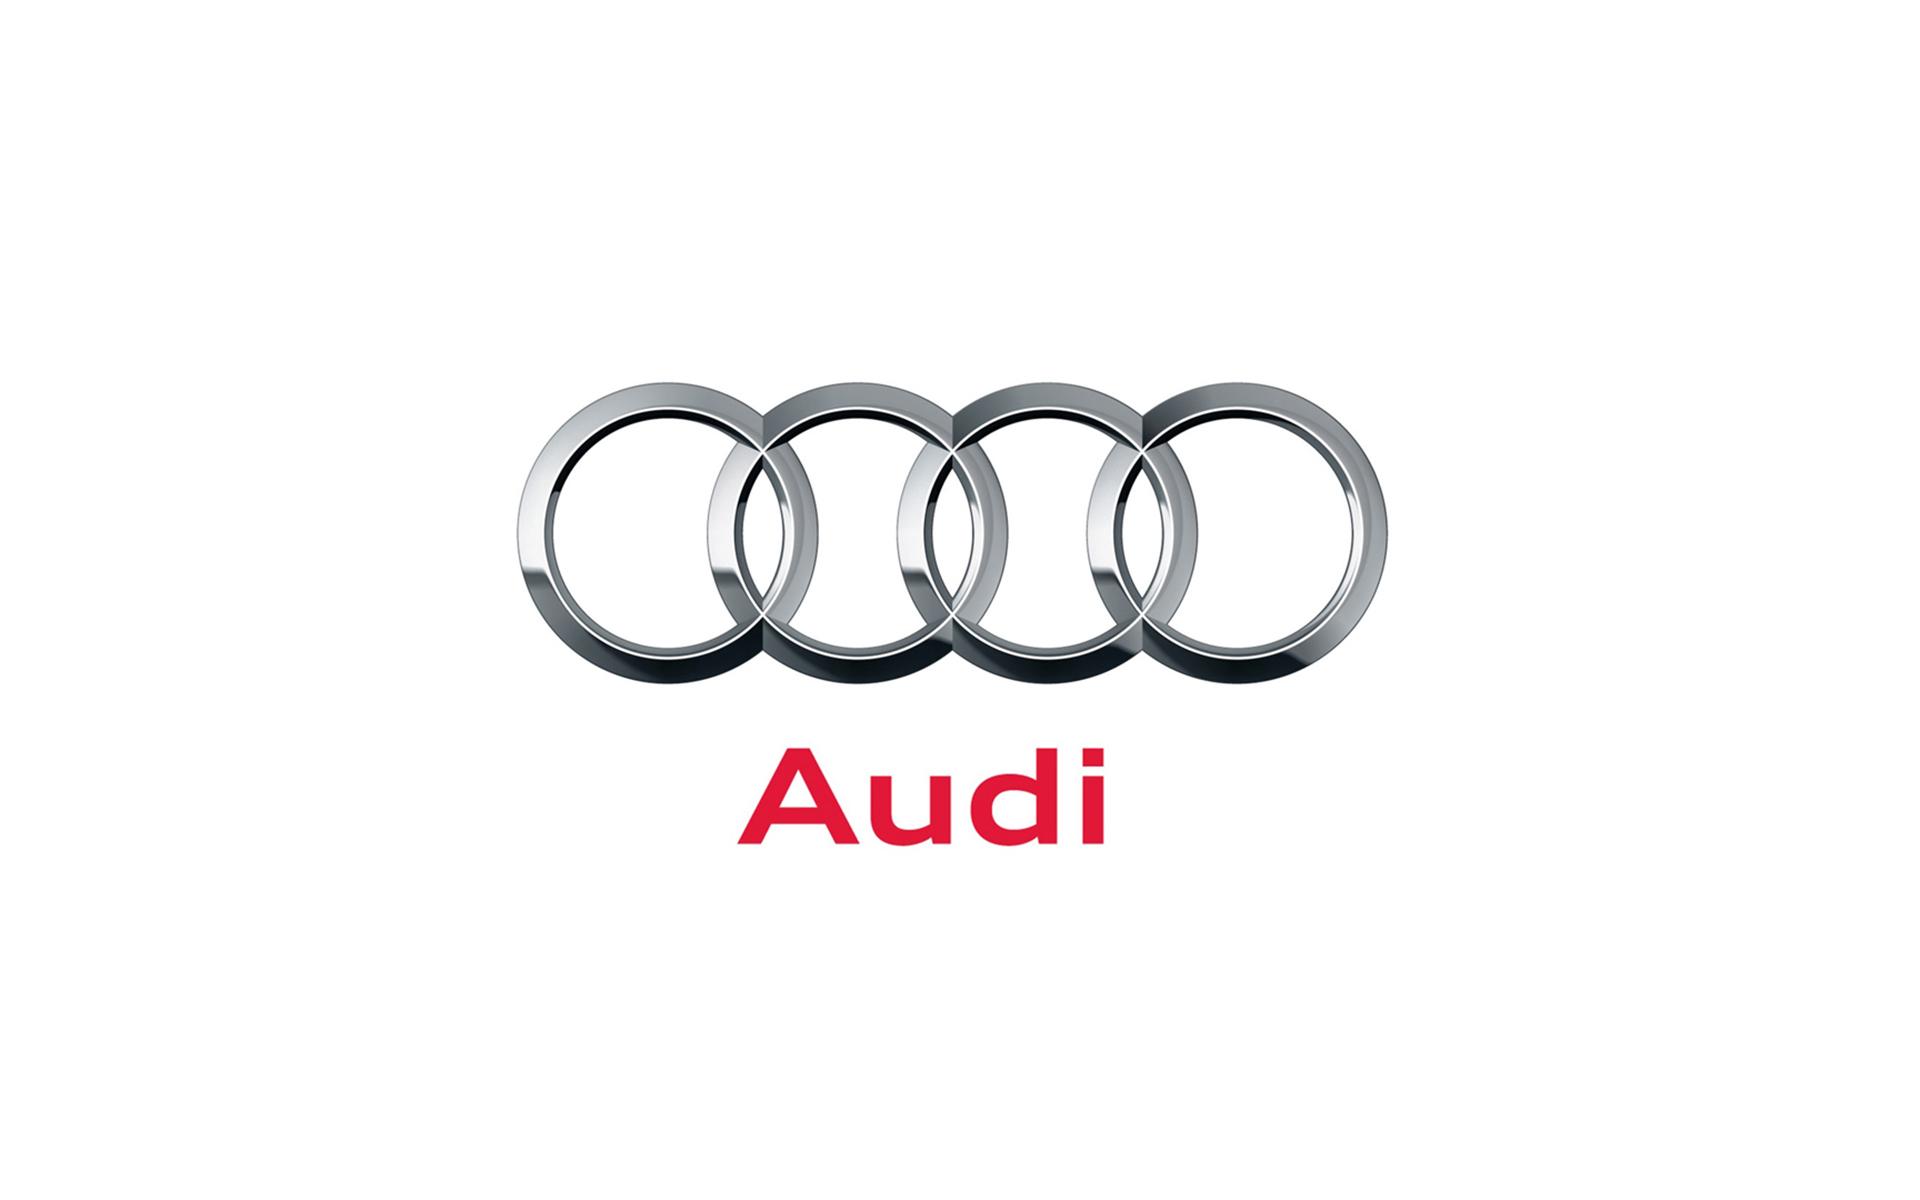 Cars Symbol Wallpaper Audi Logo Wallpaper Hd Pixelstalk Net